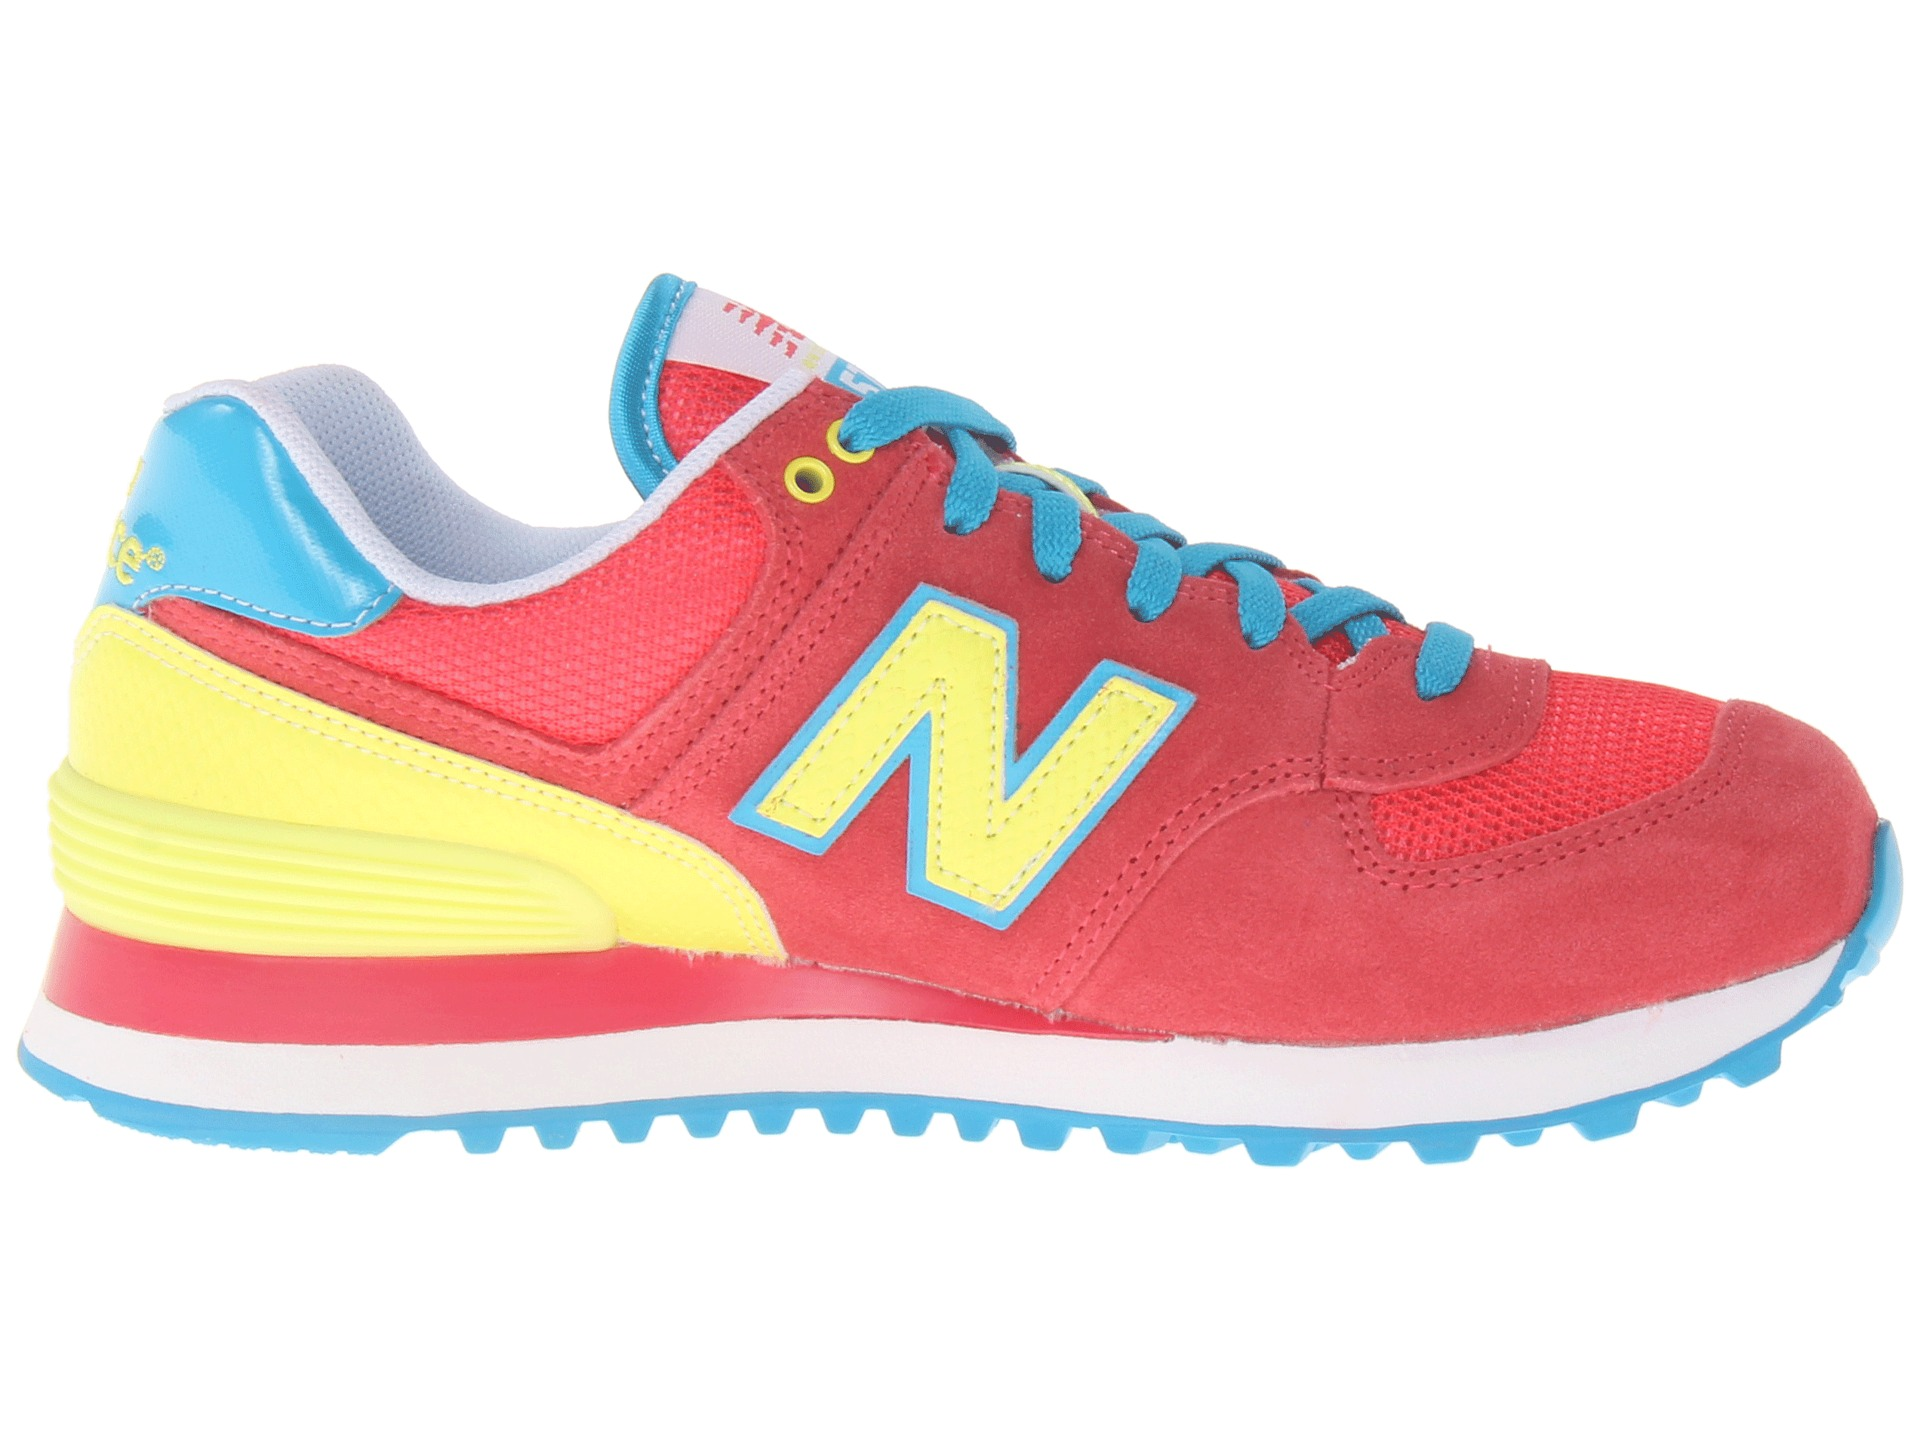 Shoe Carnival New Balance V